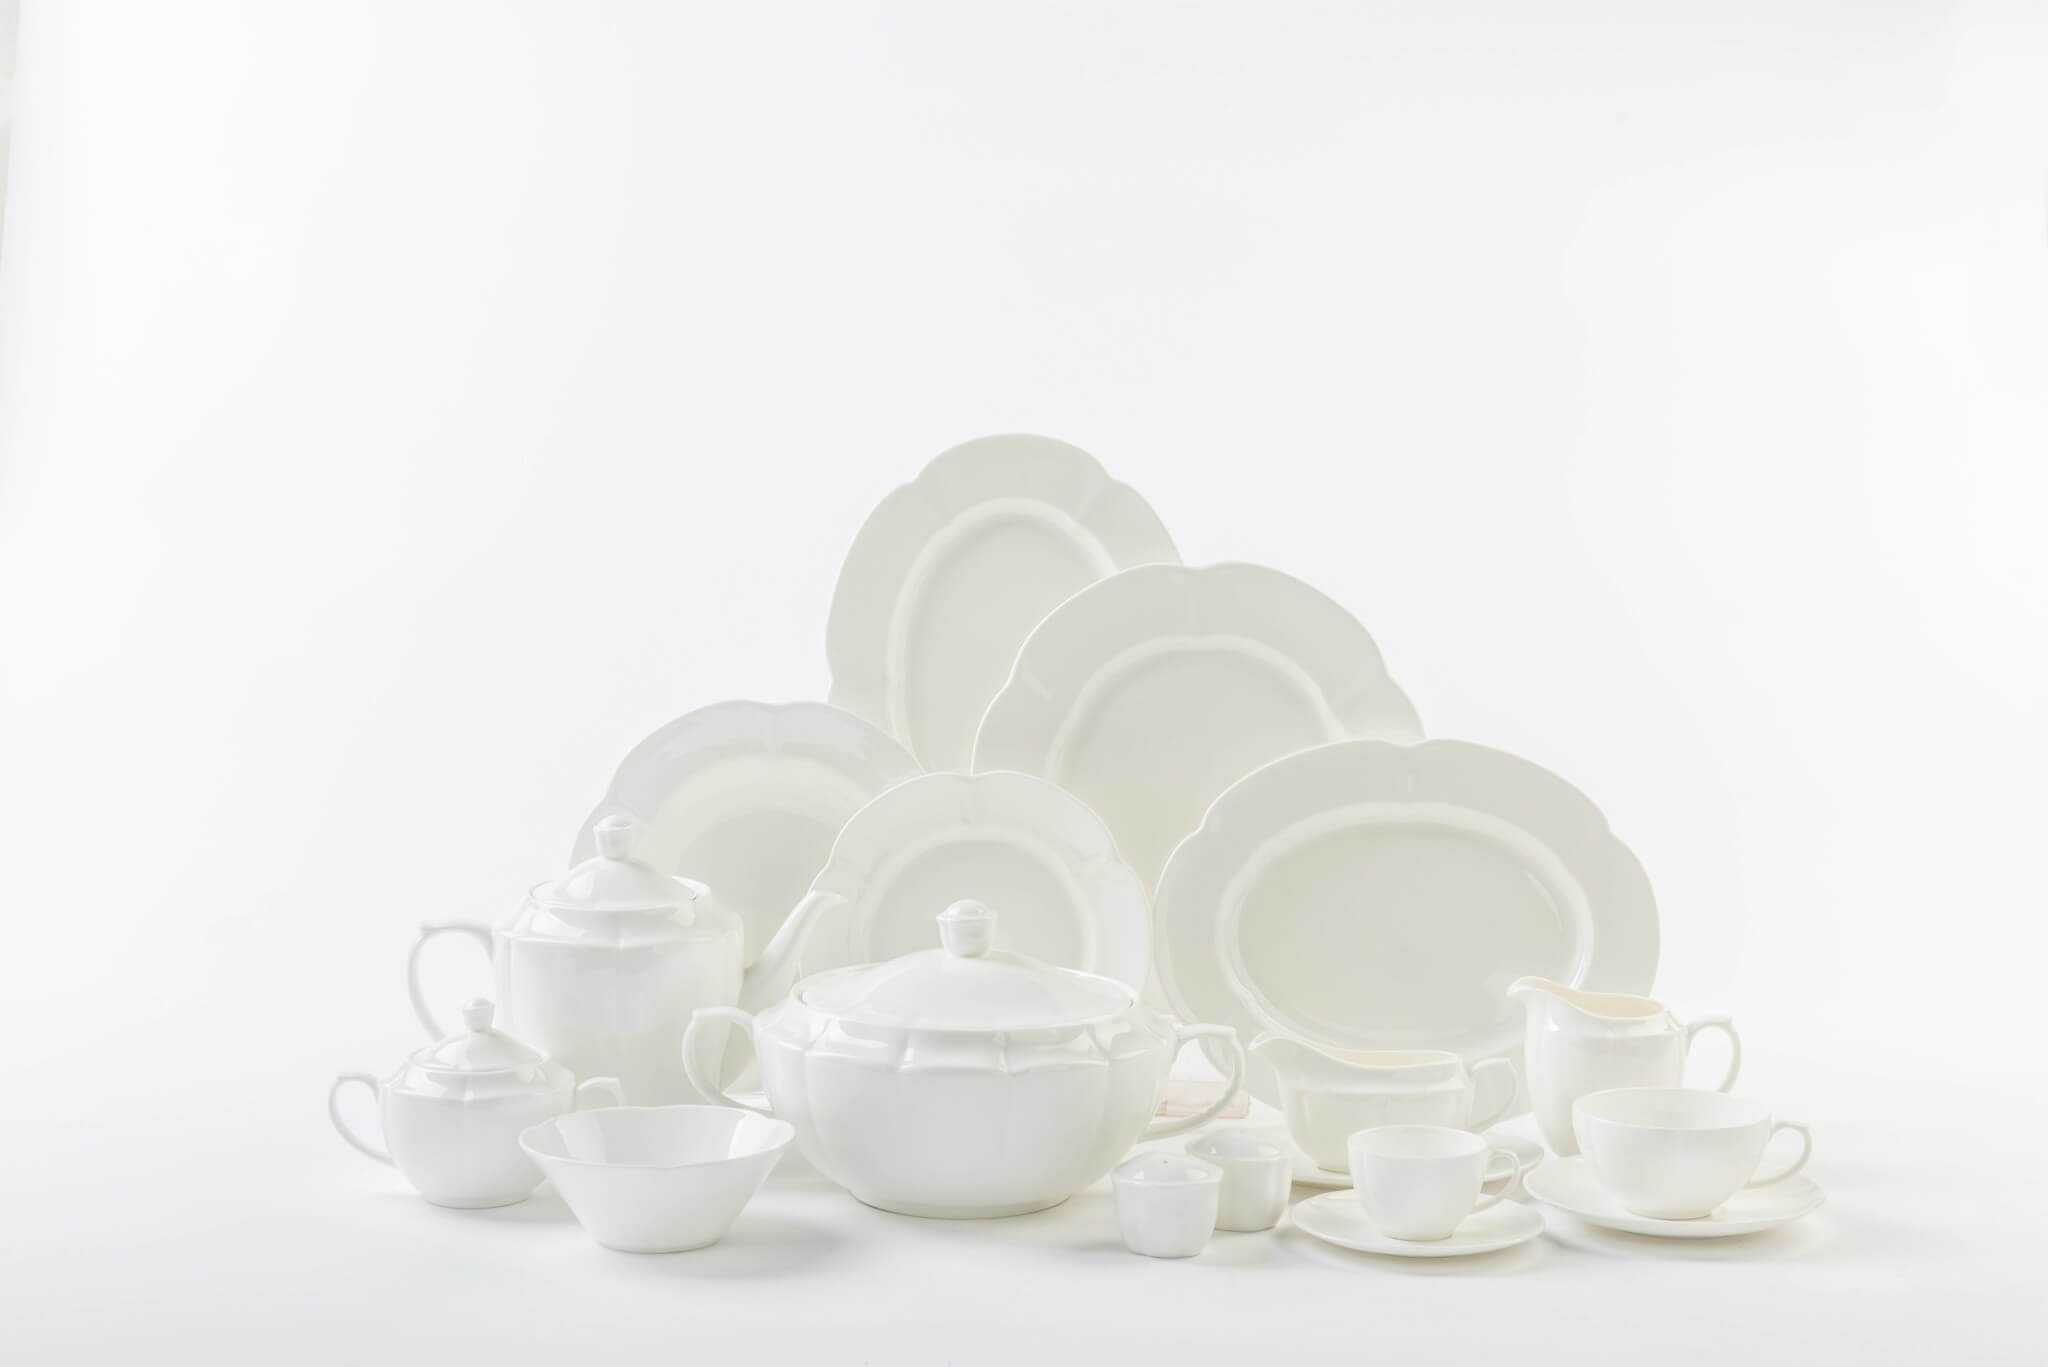 embossed fine bone china & embossed fine bone china - Fine Bone China Products Manufacturer ...